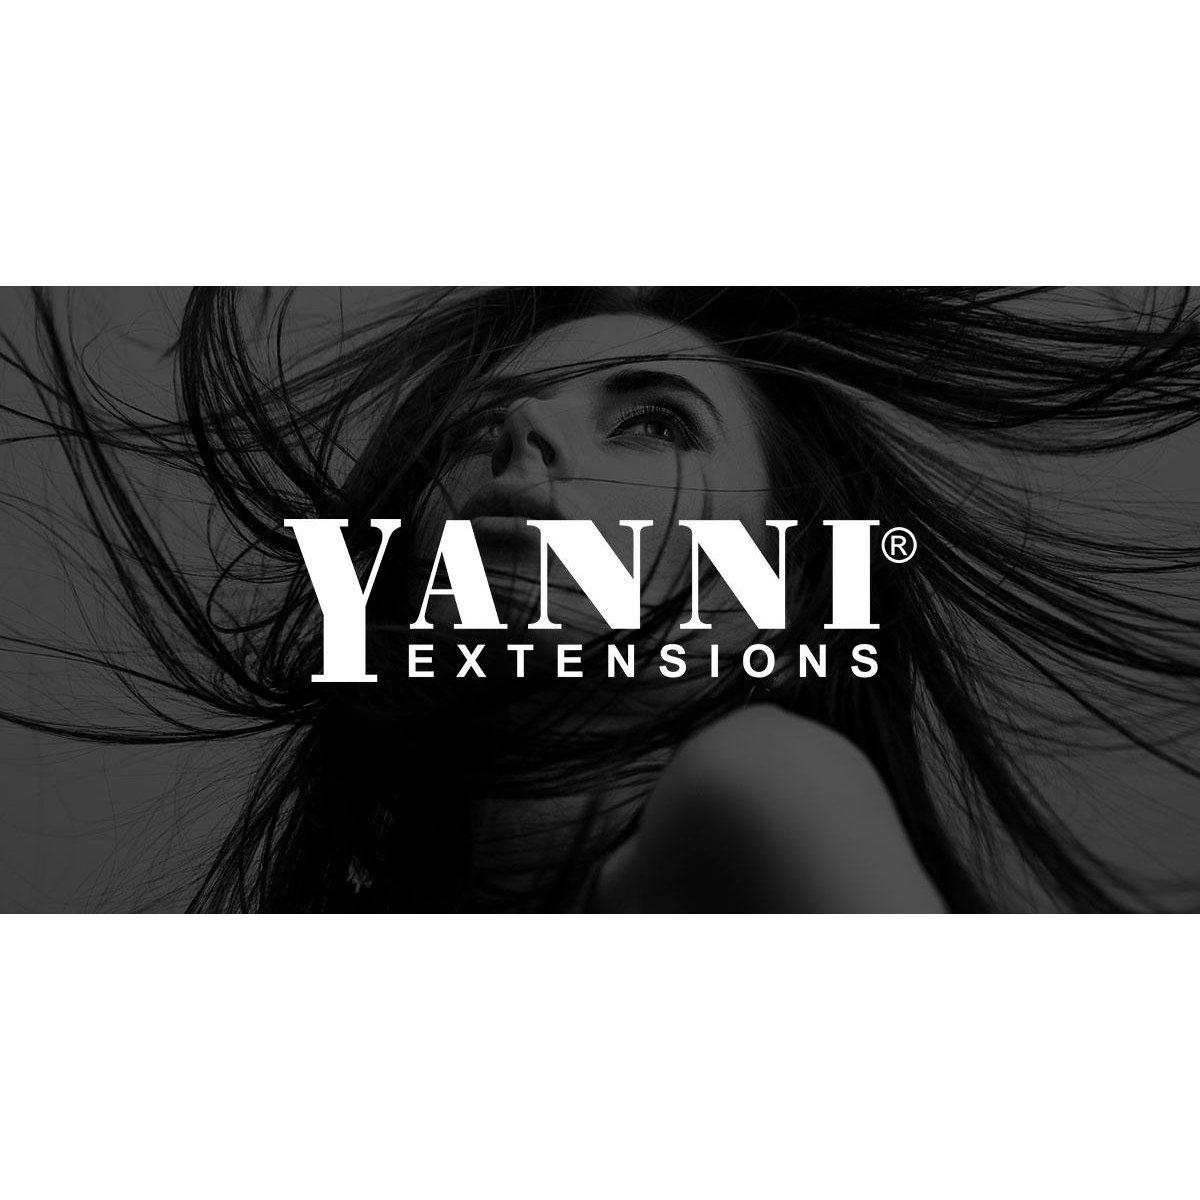 Yanni Extensions